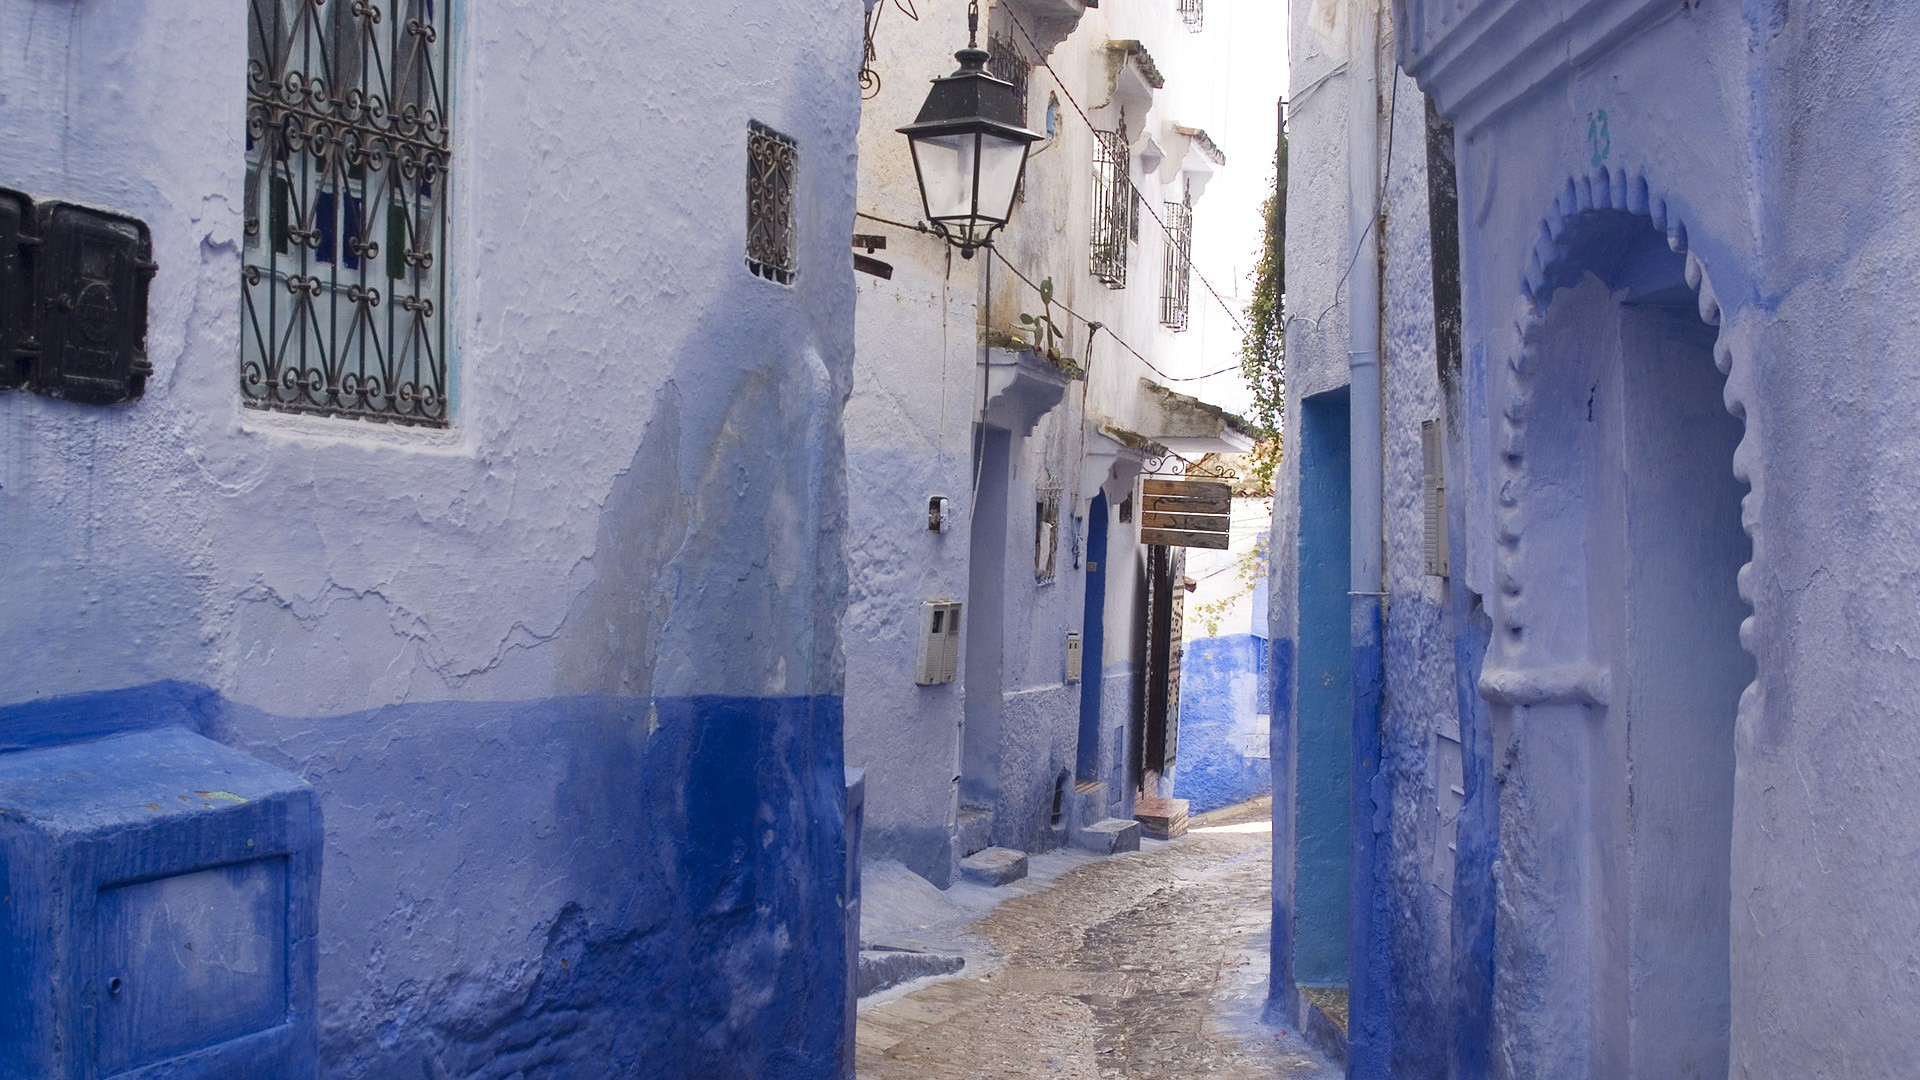 Morocco Wallpaper 1920x1080